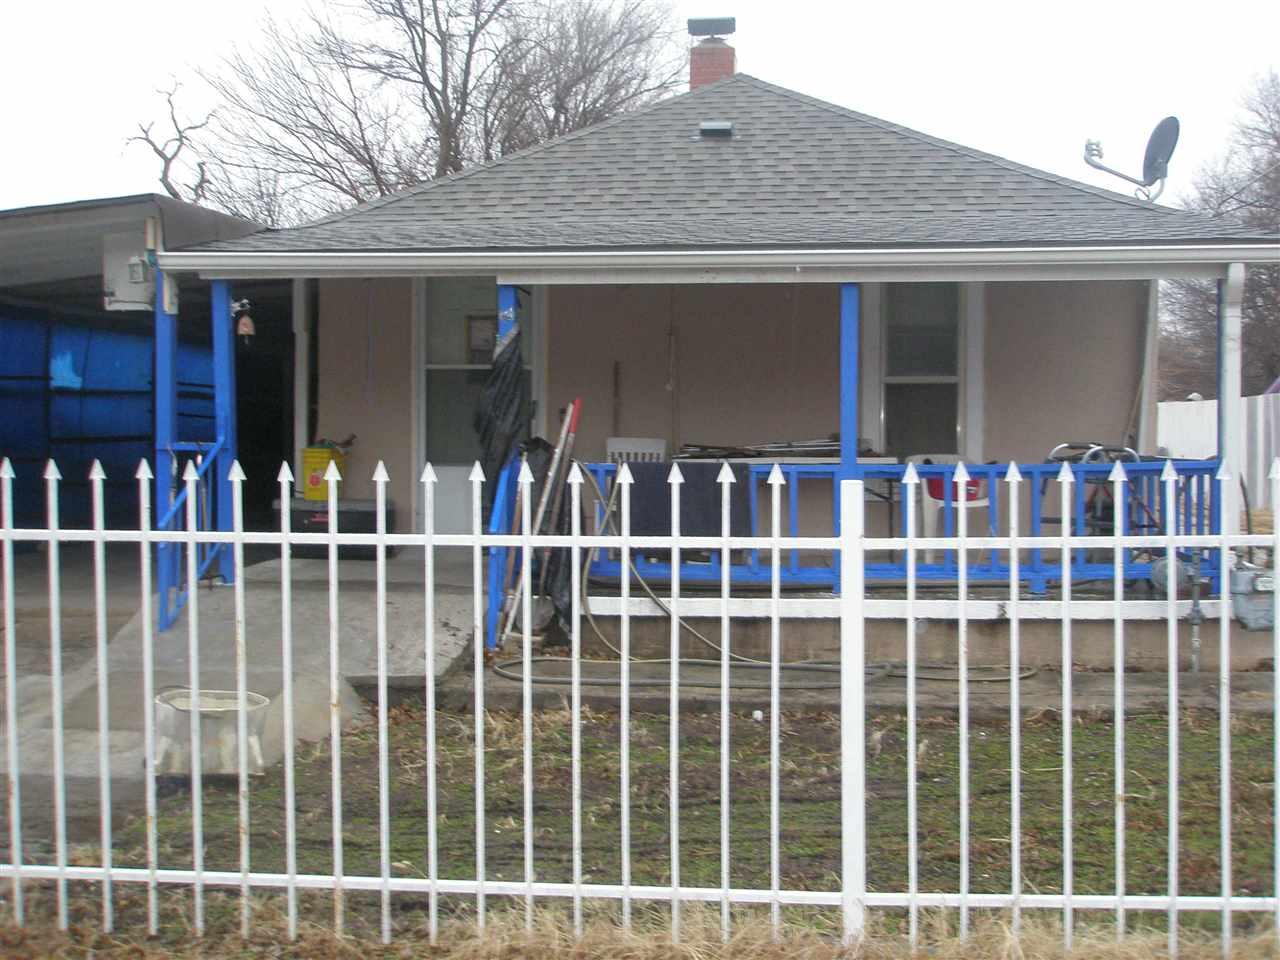 3051 N Fairview Ave, Wichita, KS, 67204